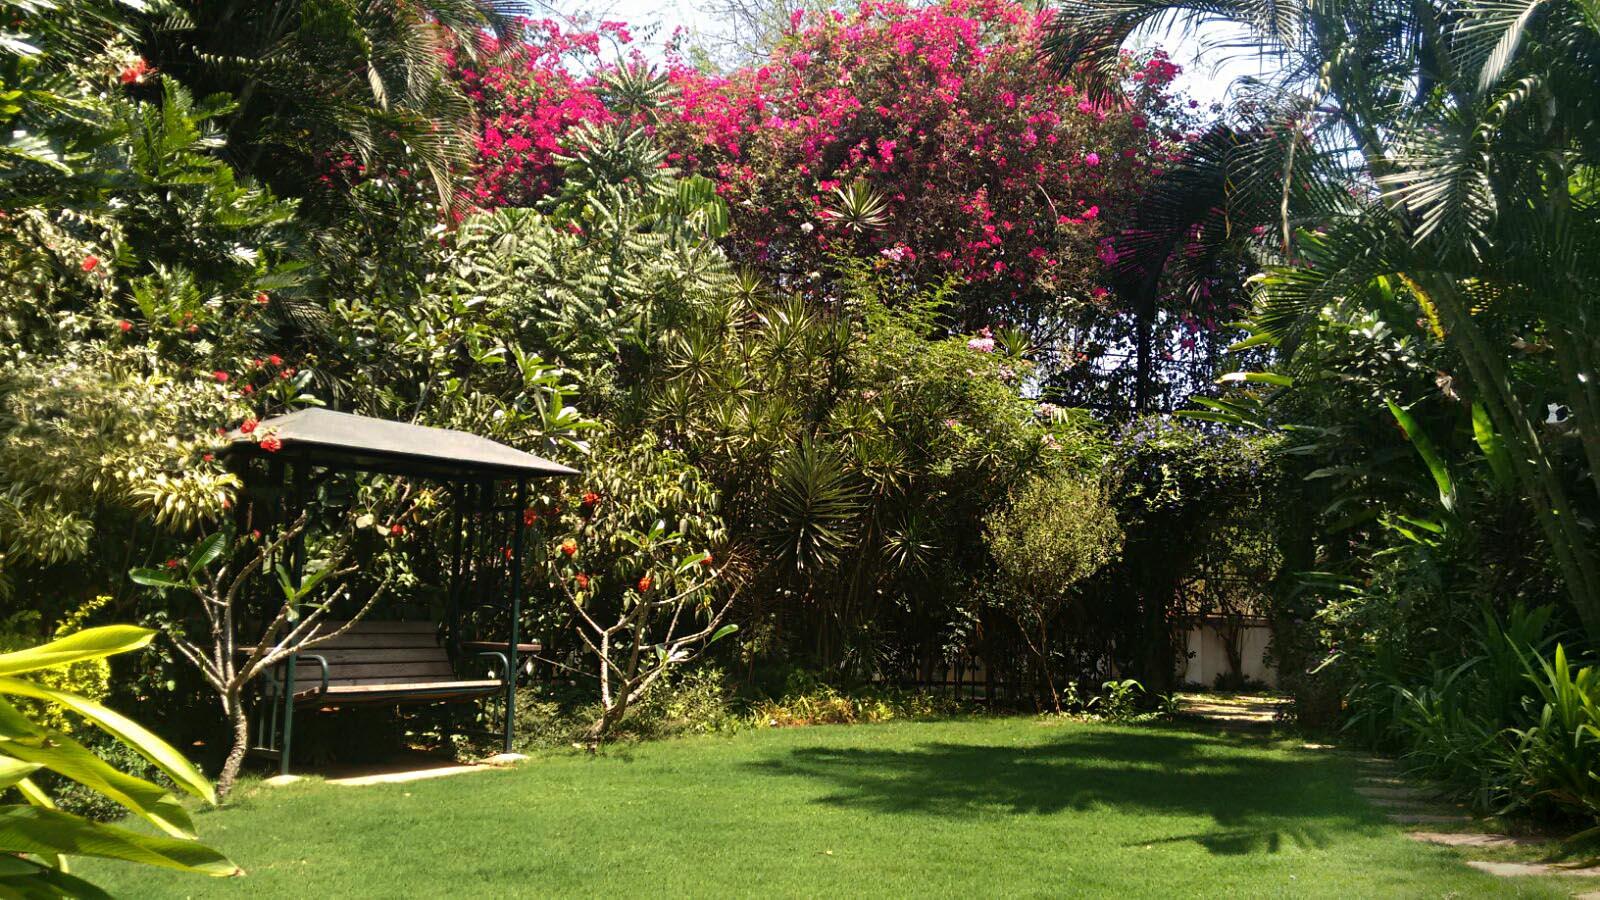 Ficus-landscape-bangalore-villa-kanak-garden-01